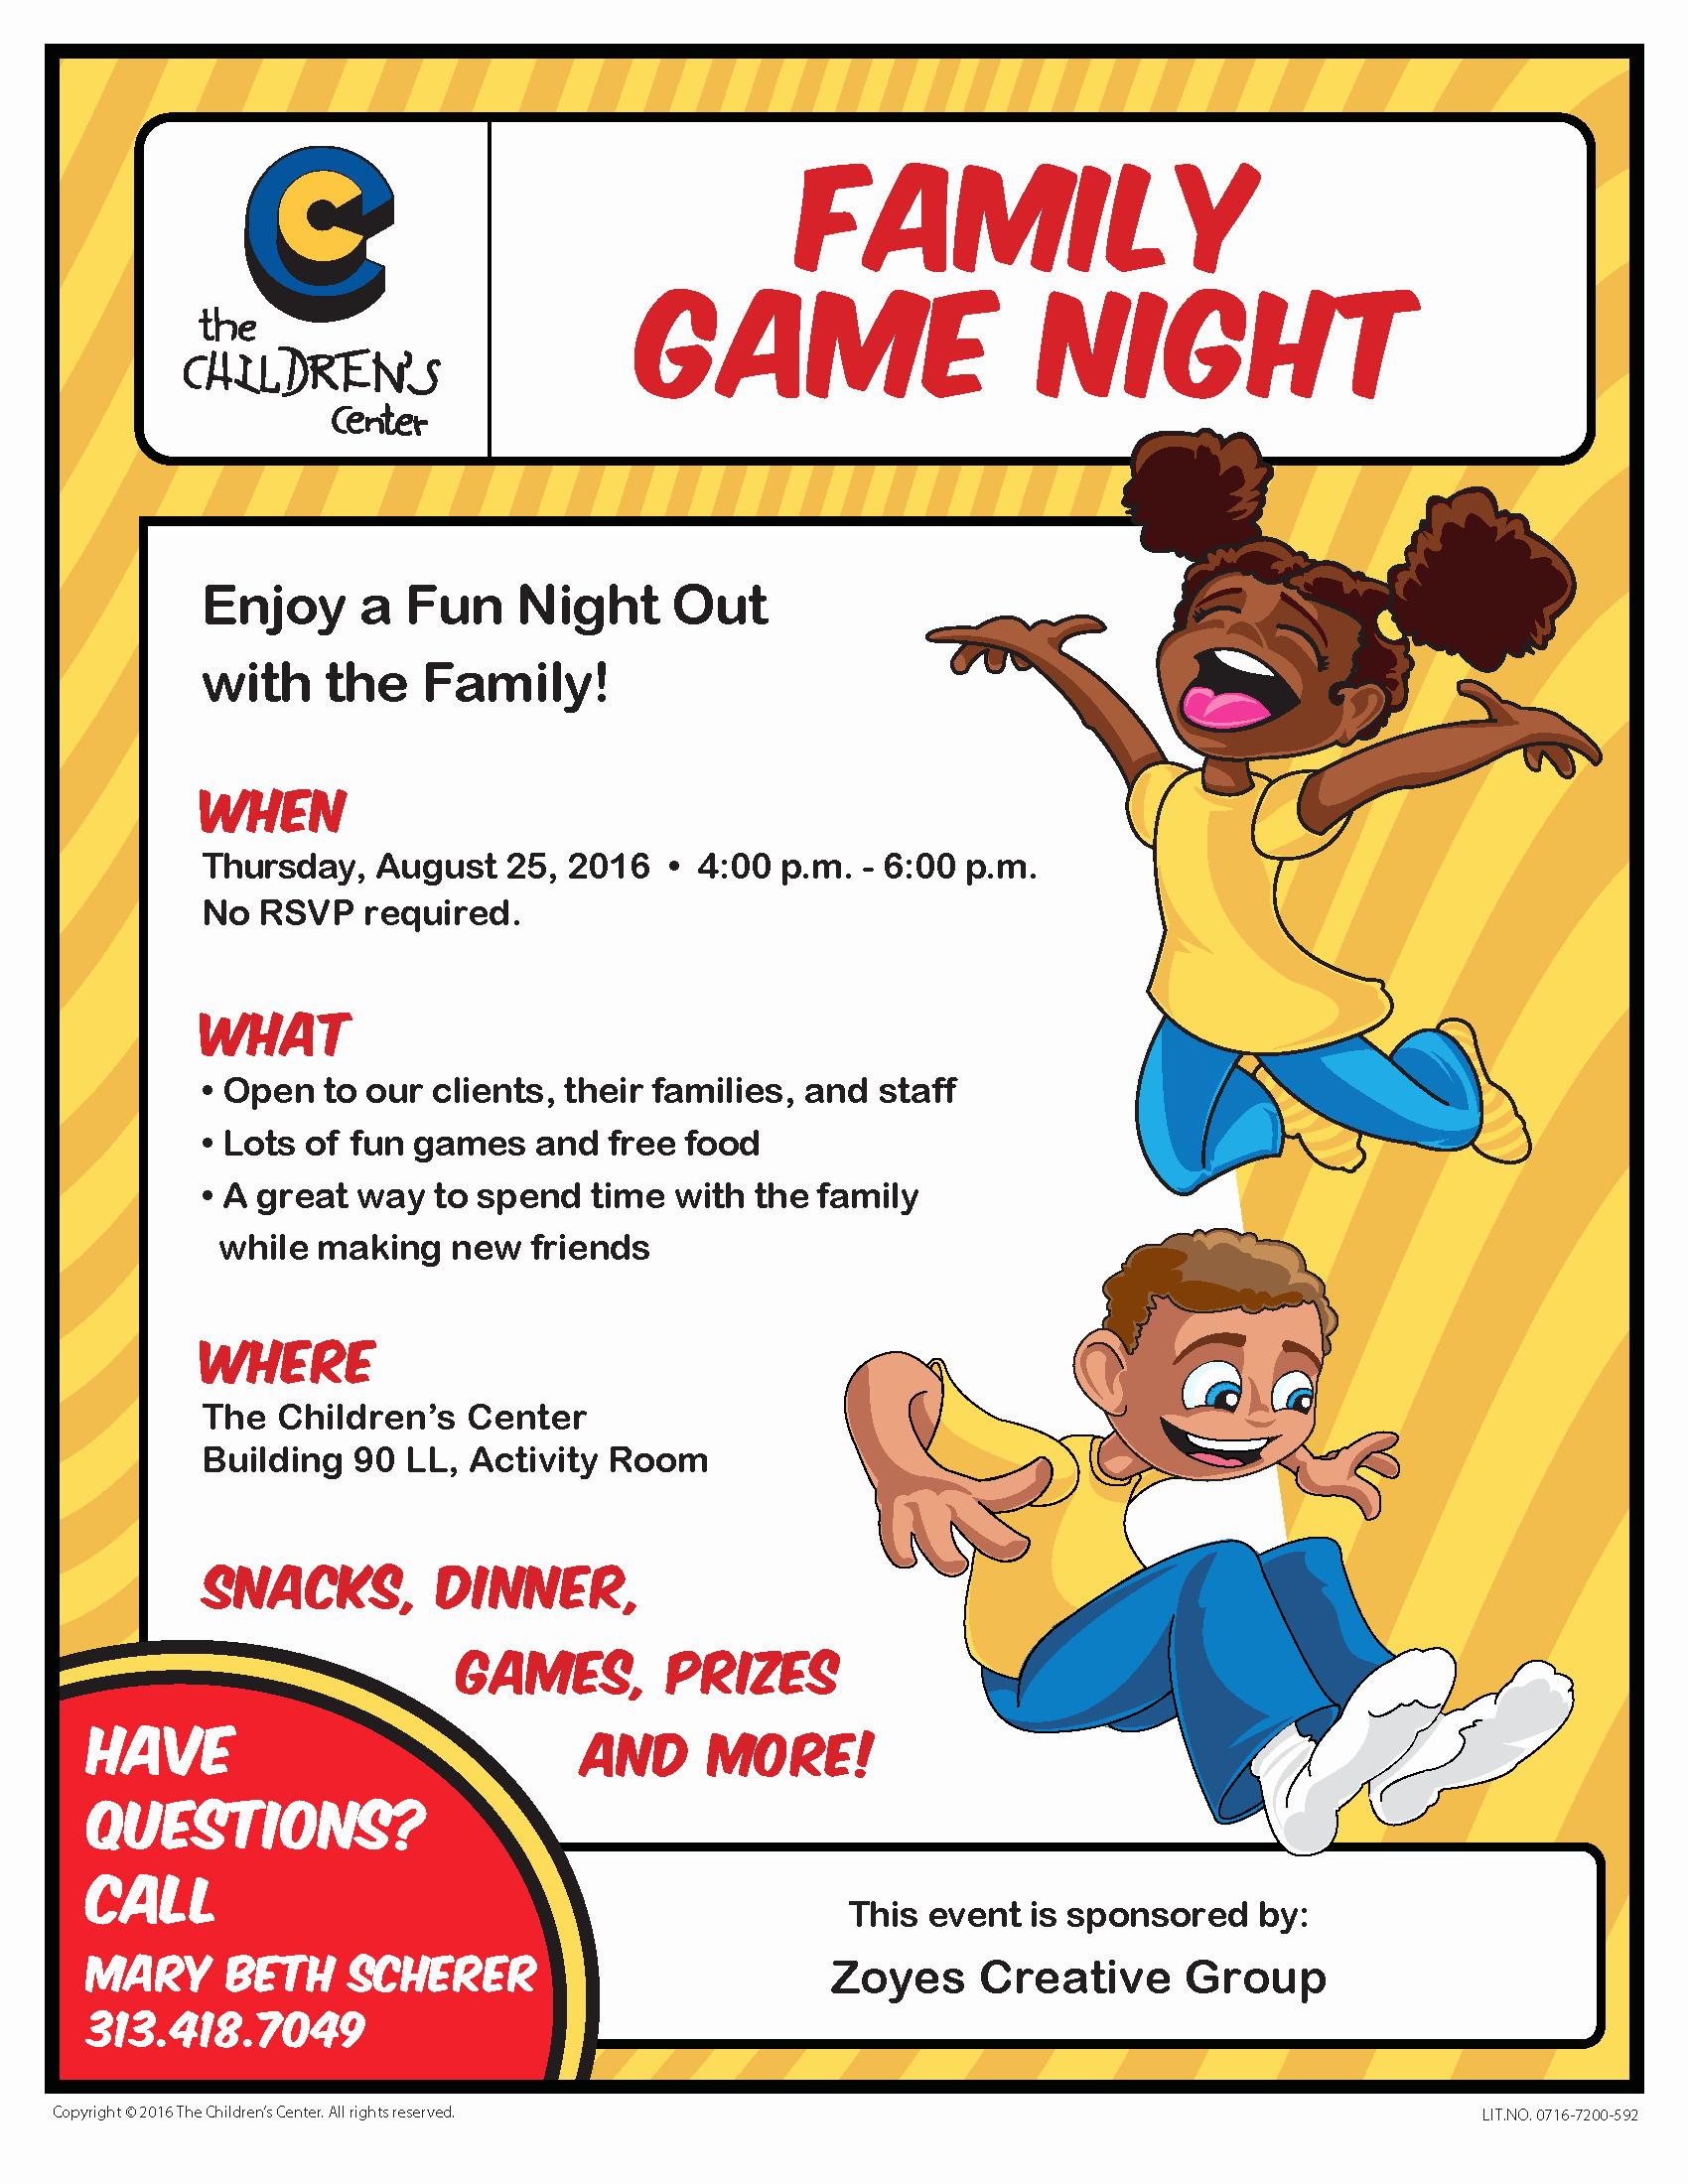 Family Fun Night Flyer Template Fresh Family Game Night